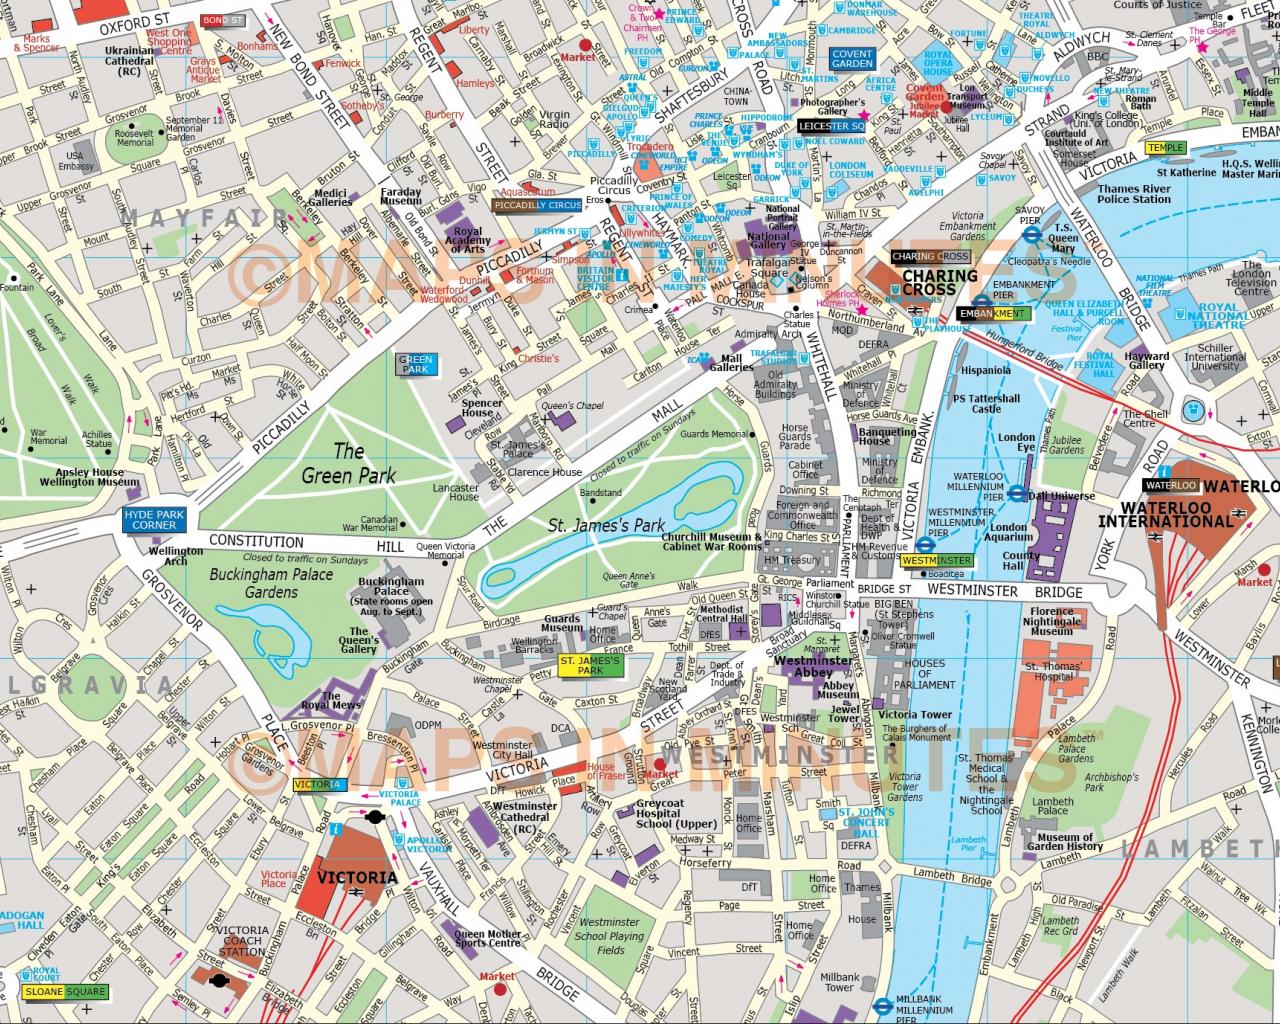 Free London Street Map.Free Download London City Map 3 Widescreen Wallpaper